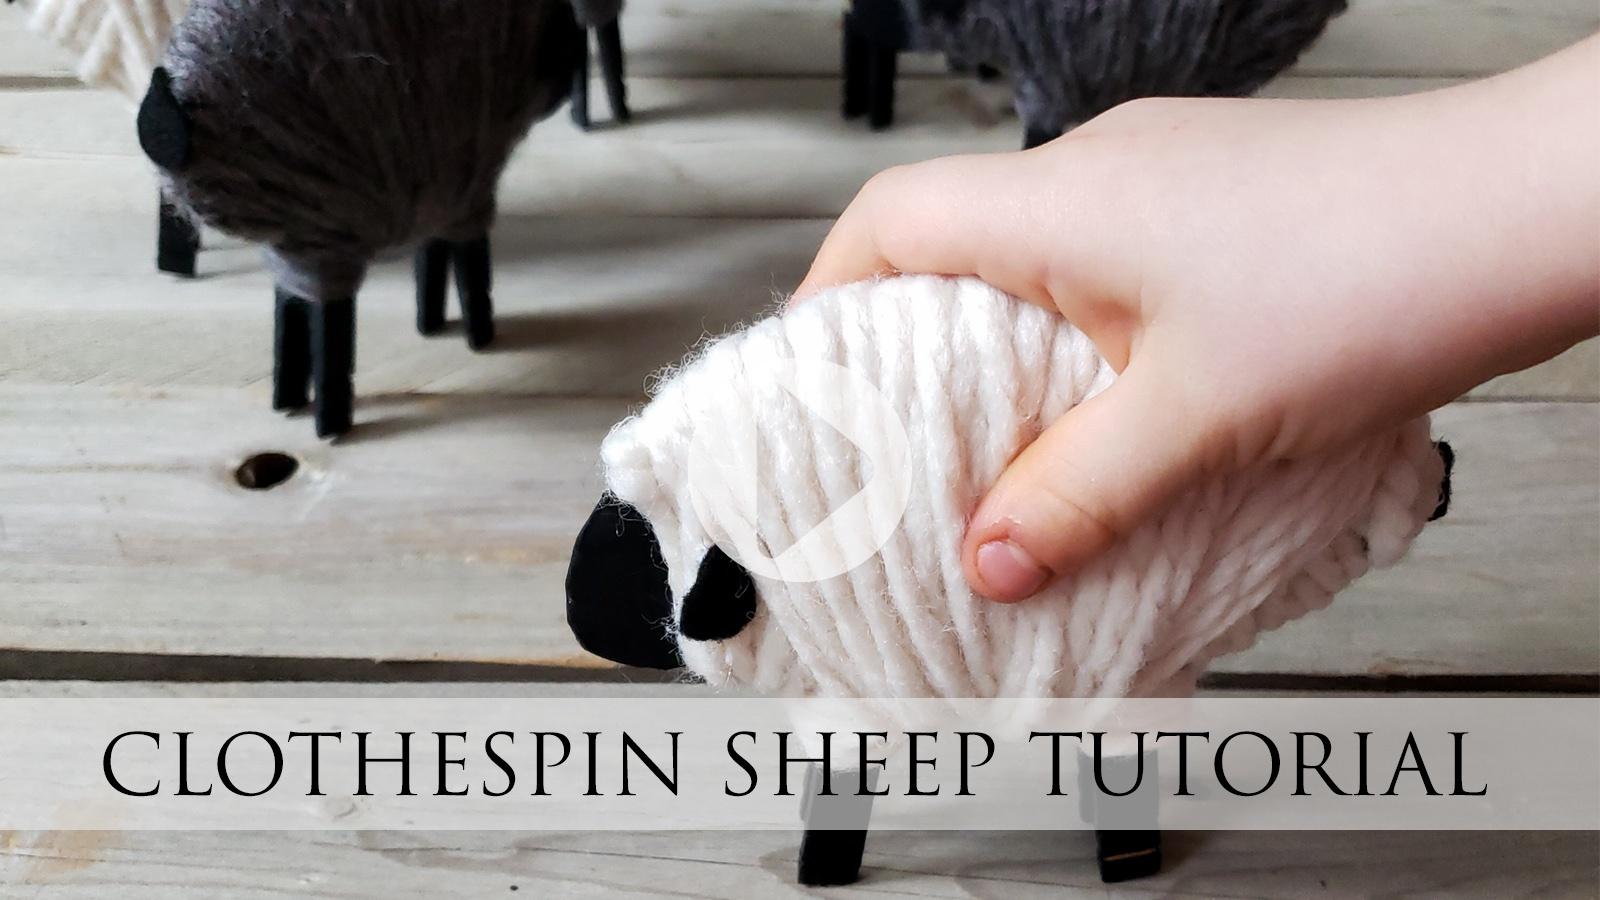 Adorable DIY Clothespin Sheep Tutorial by Larissa of Prodigal Pieces | prodigalpieces.com #prodigalpieces